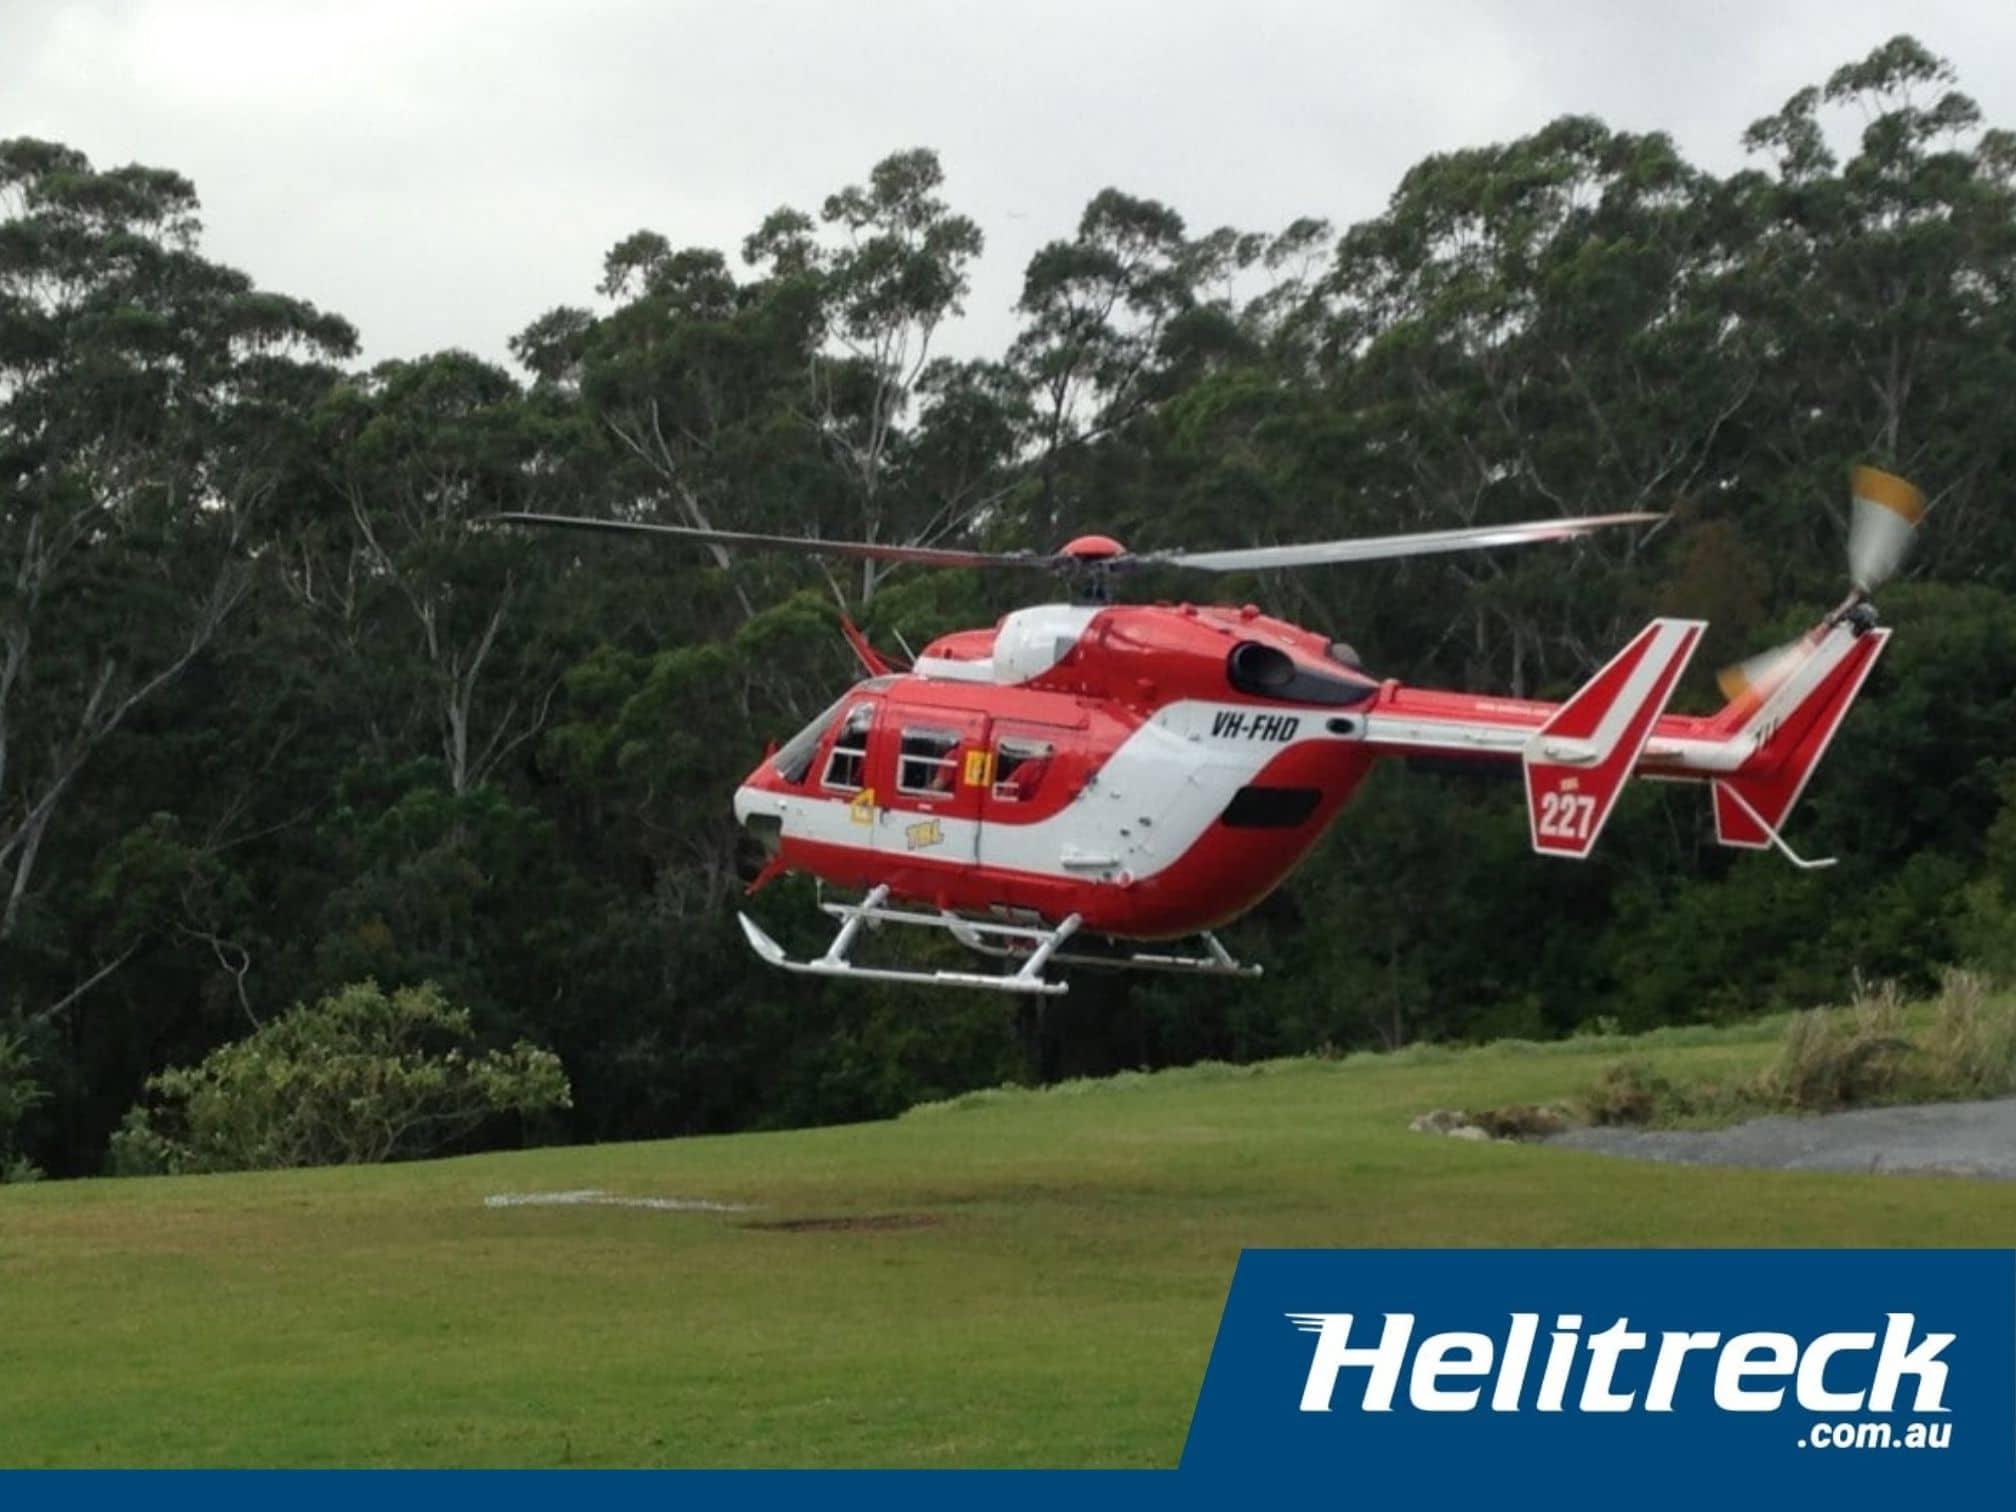 HelicopterBK117 B2-VH-FHD-5